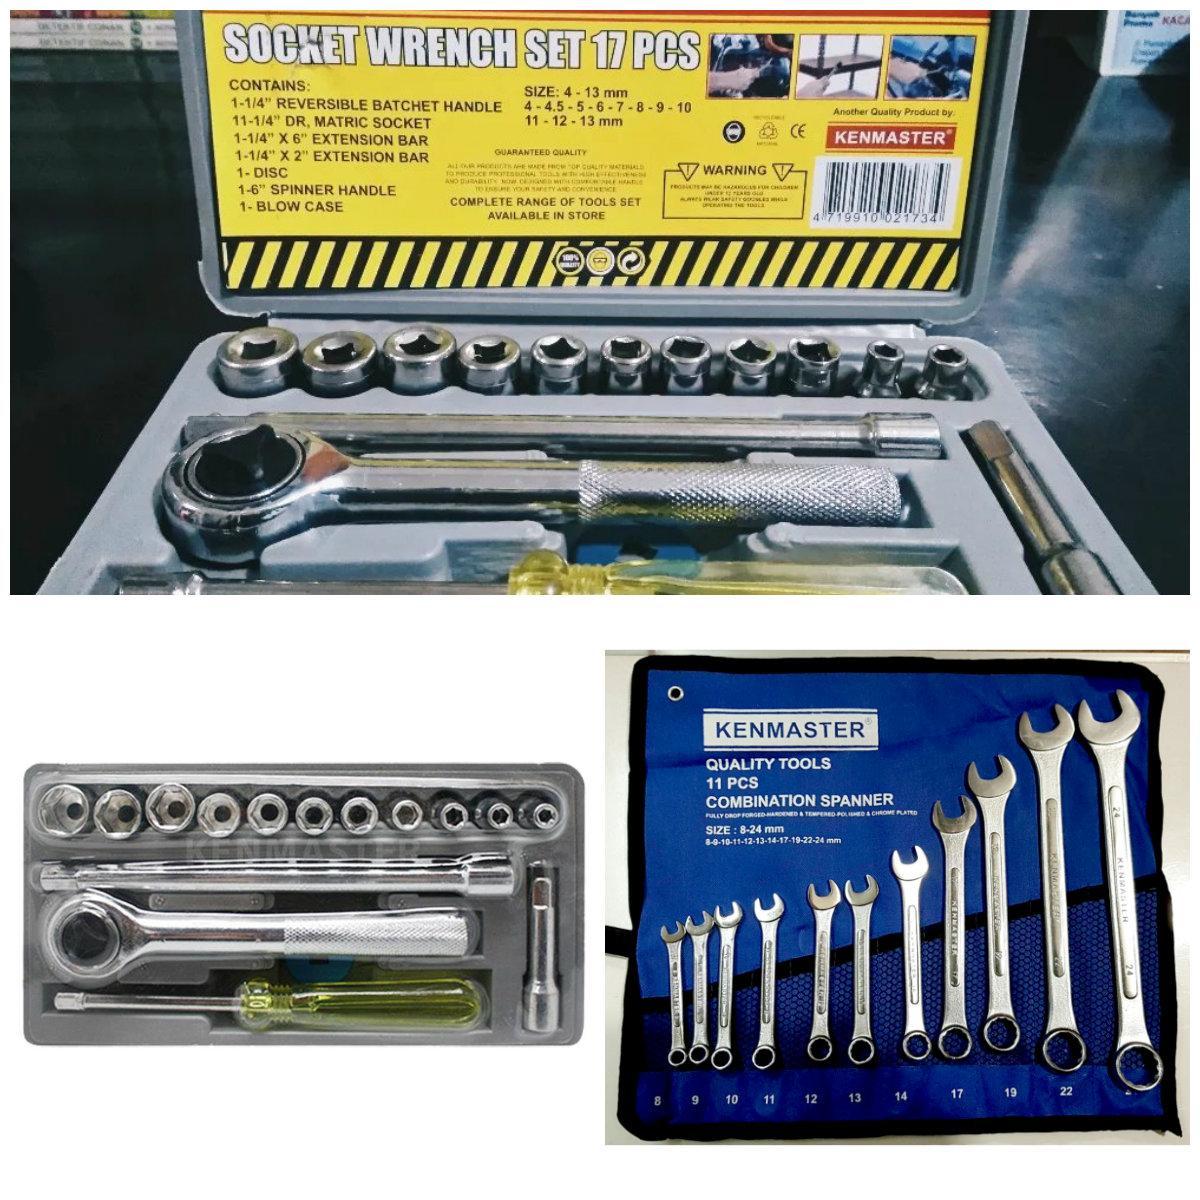 Kenmaster Kunci Ring Pas 11 Pcs 8mm 24mm Cek Harga Terkini Dan Set Combination Wrench Aizu 8 24 Mm 14pcs Paket Sok Sock 17